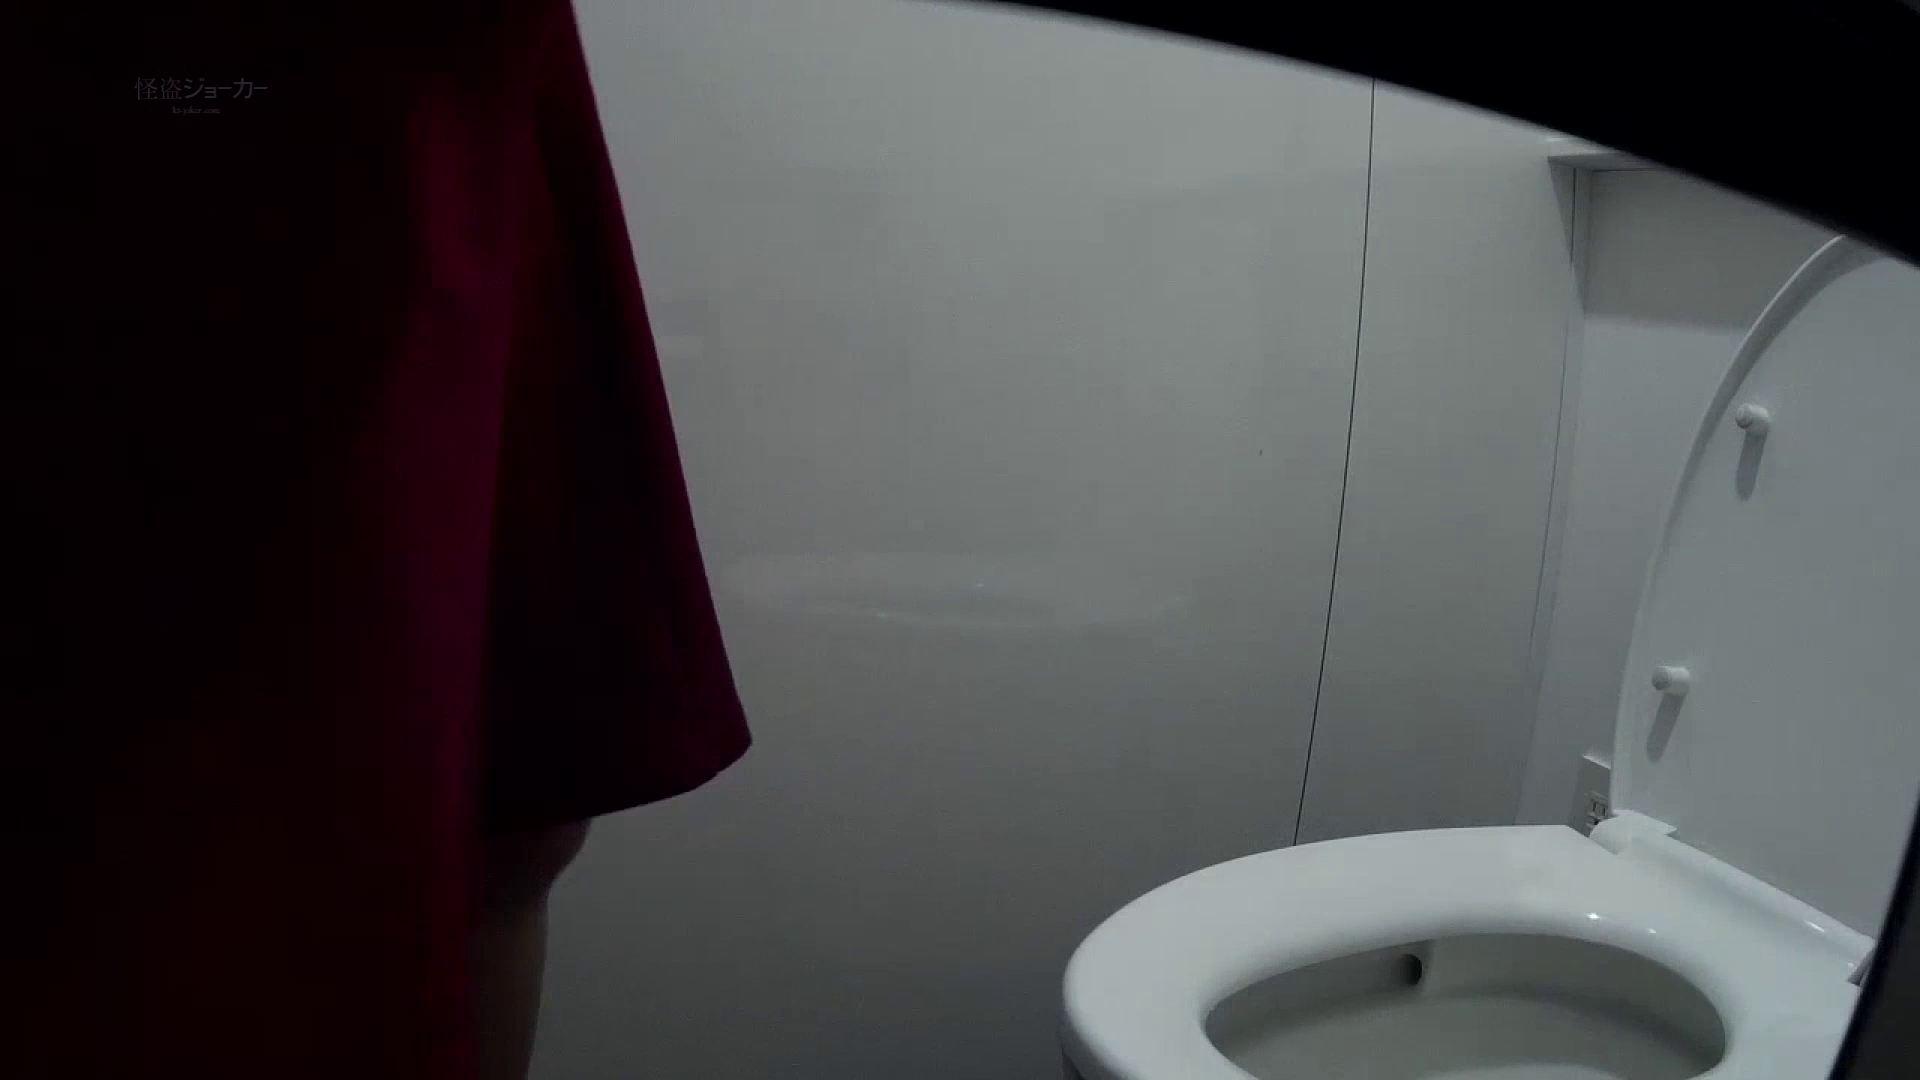 有名大学女性洗面所 vol.58 アンダーヘアーも冬支度? 高画質動画  69画像 40